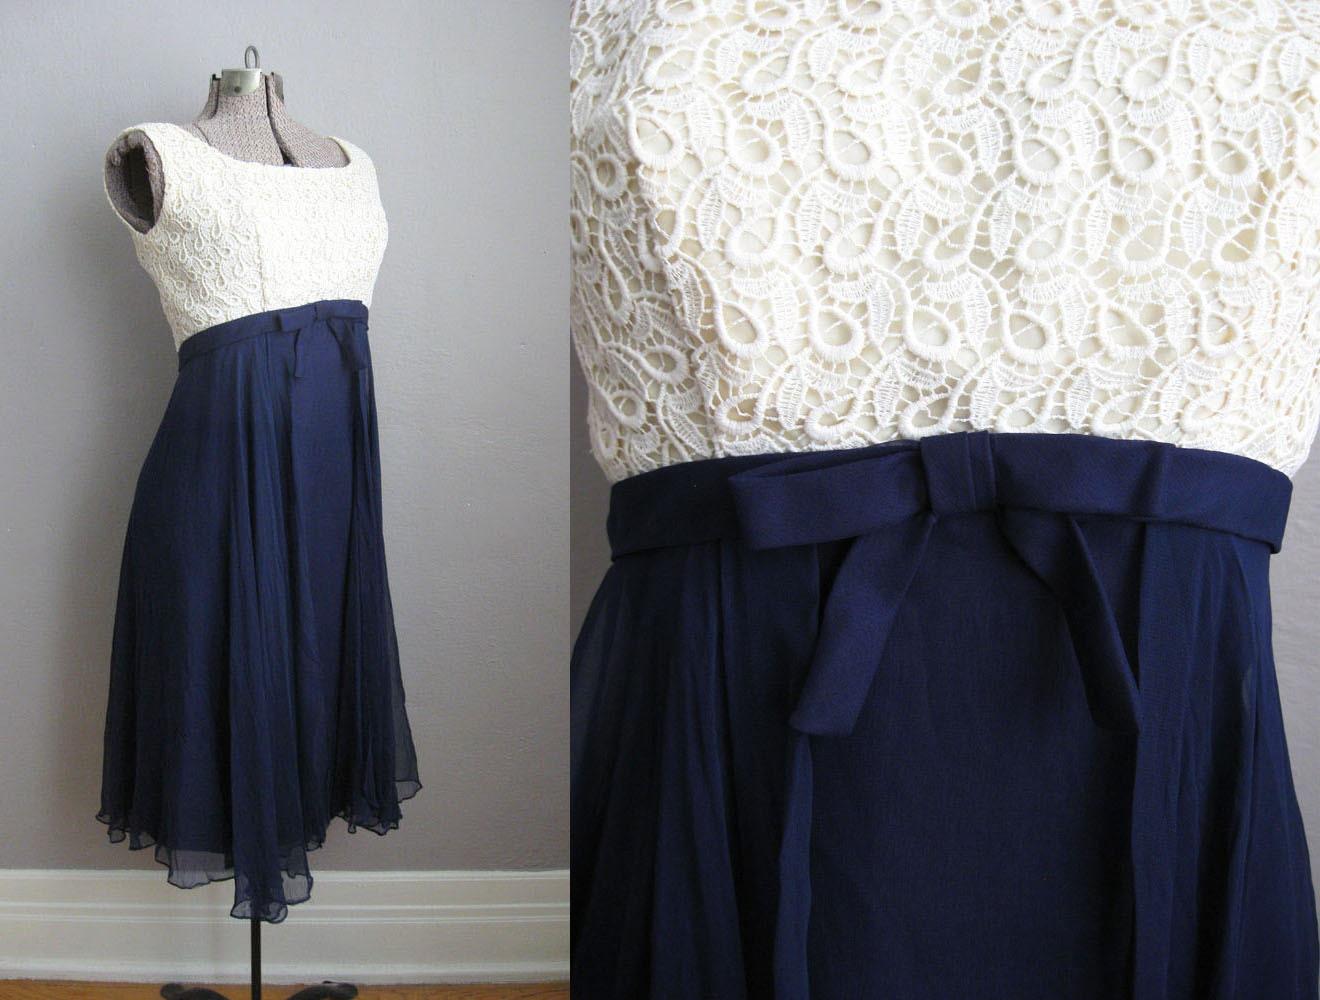 ann es 1960 robe de cocktail vintage ann es 60 robe broderie. Black Bedroom Furniture Sets. Home Design Ideas